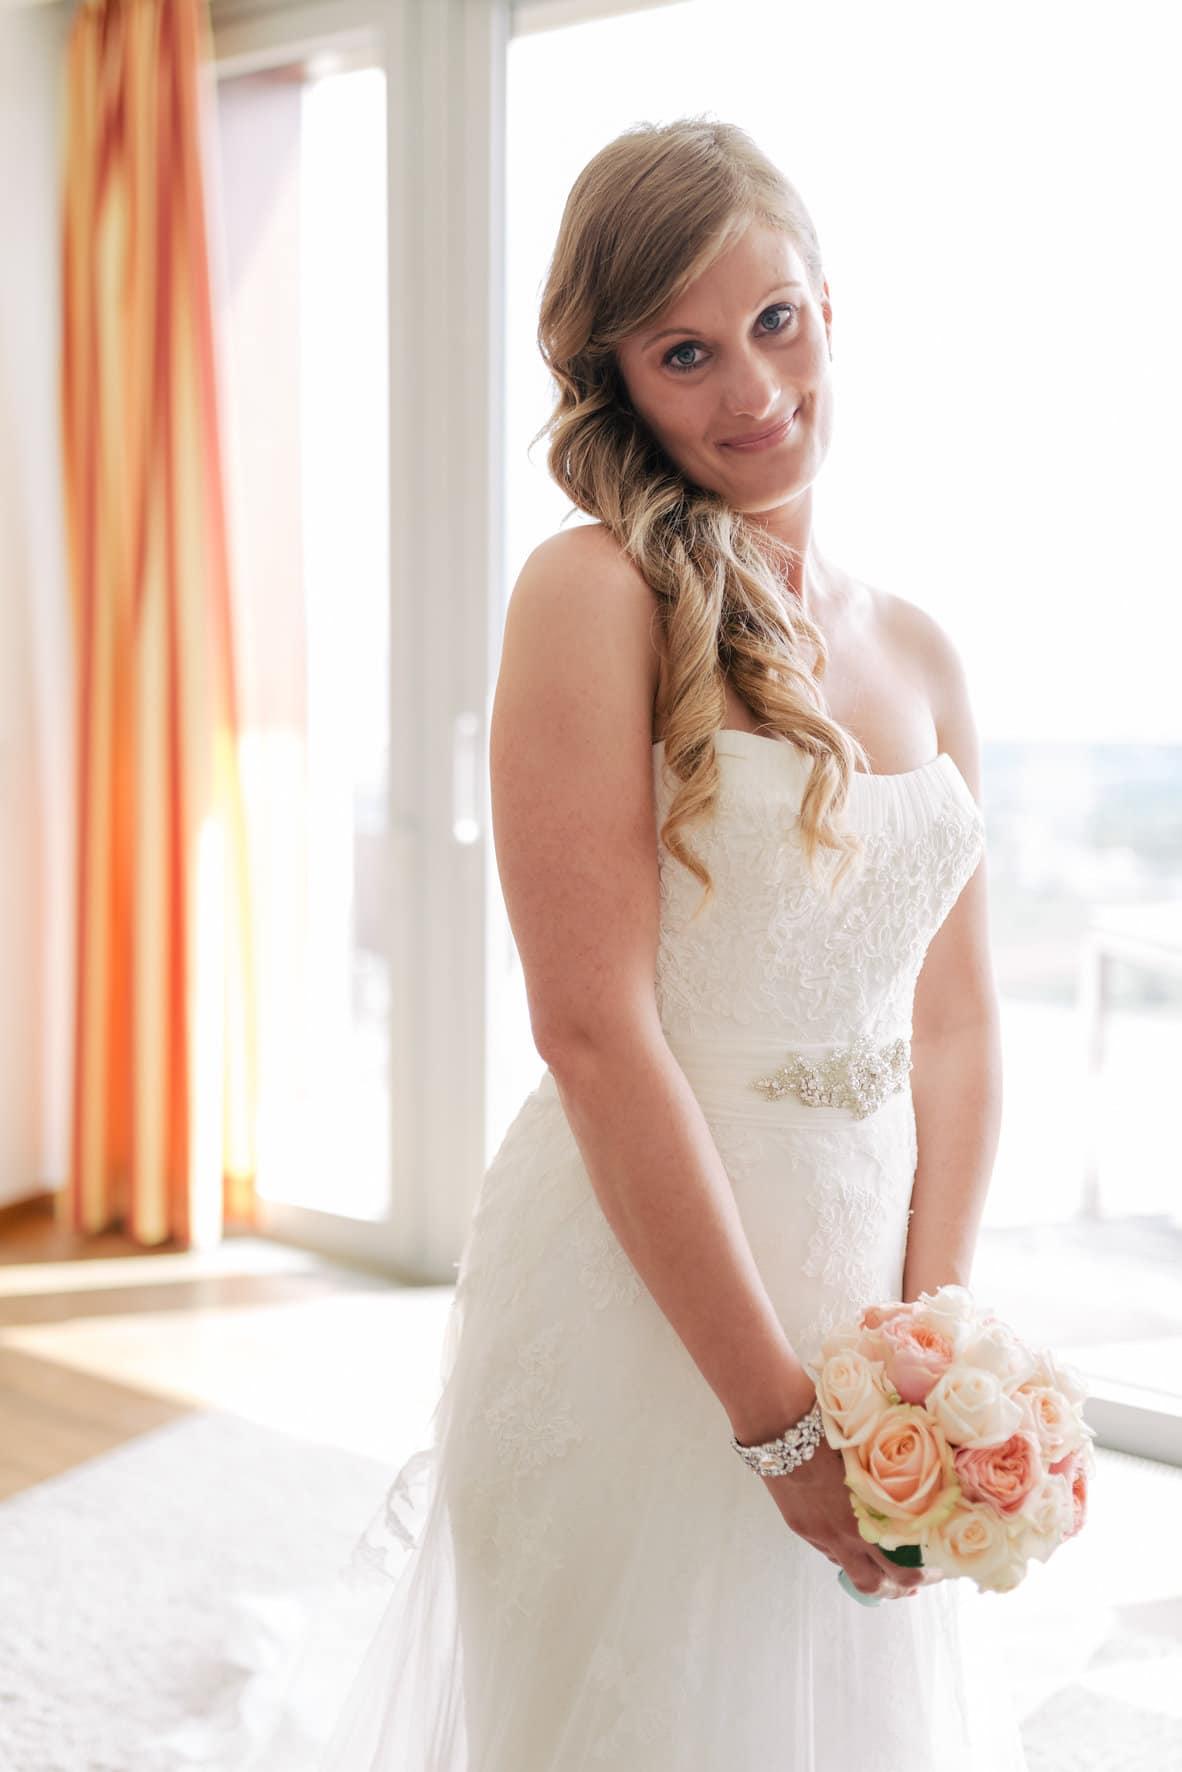 Jasmin & Clemens, wedding hair by Carola Claudia Staudinger | Fotos by Xenia Bluhm